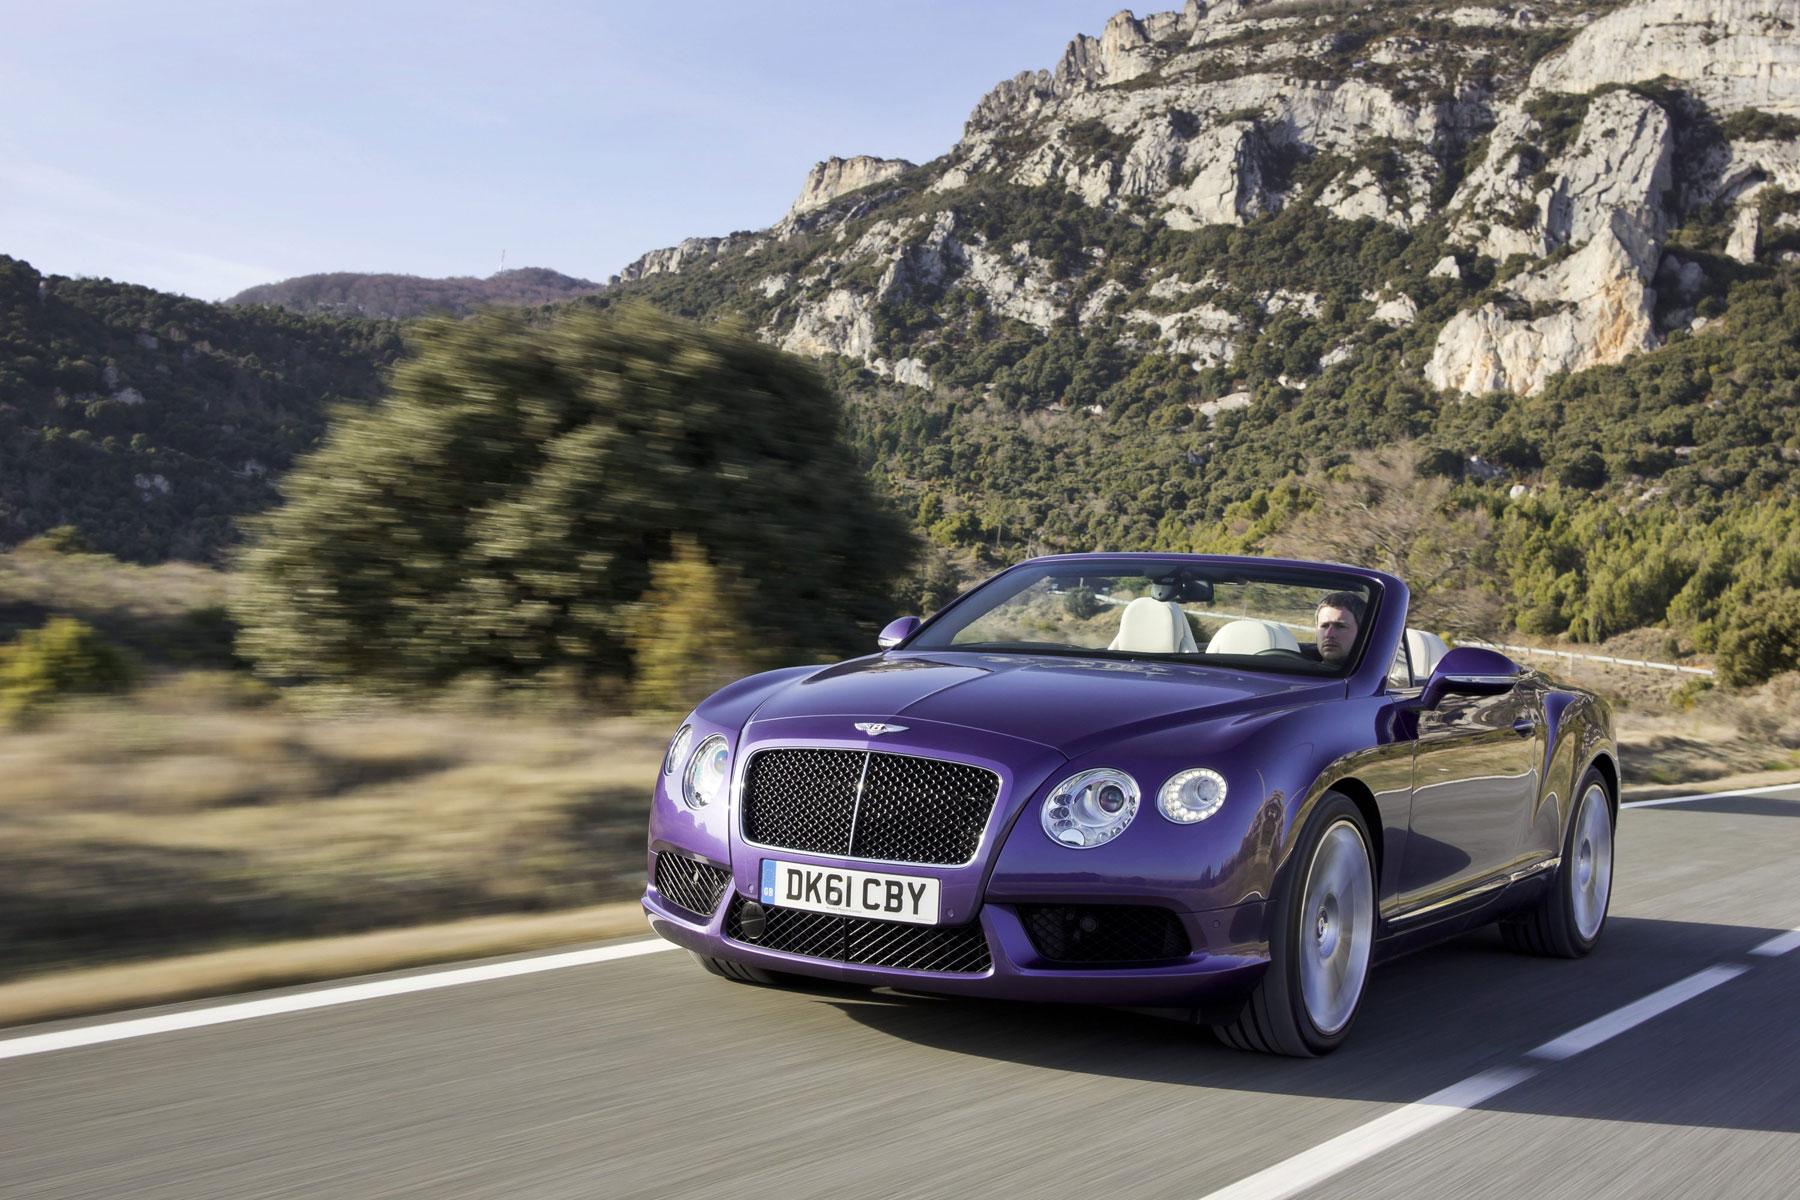 New Bentley Continental Gtc V8 Arrives In Geneva